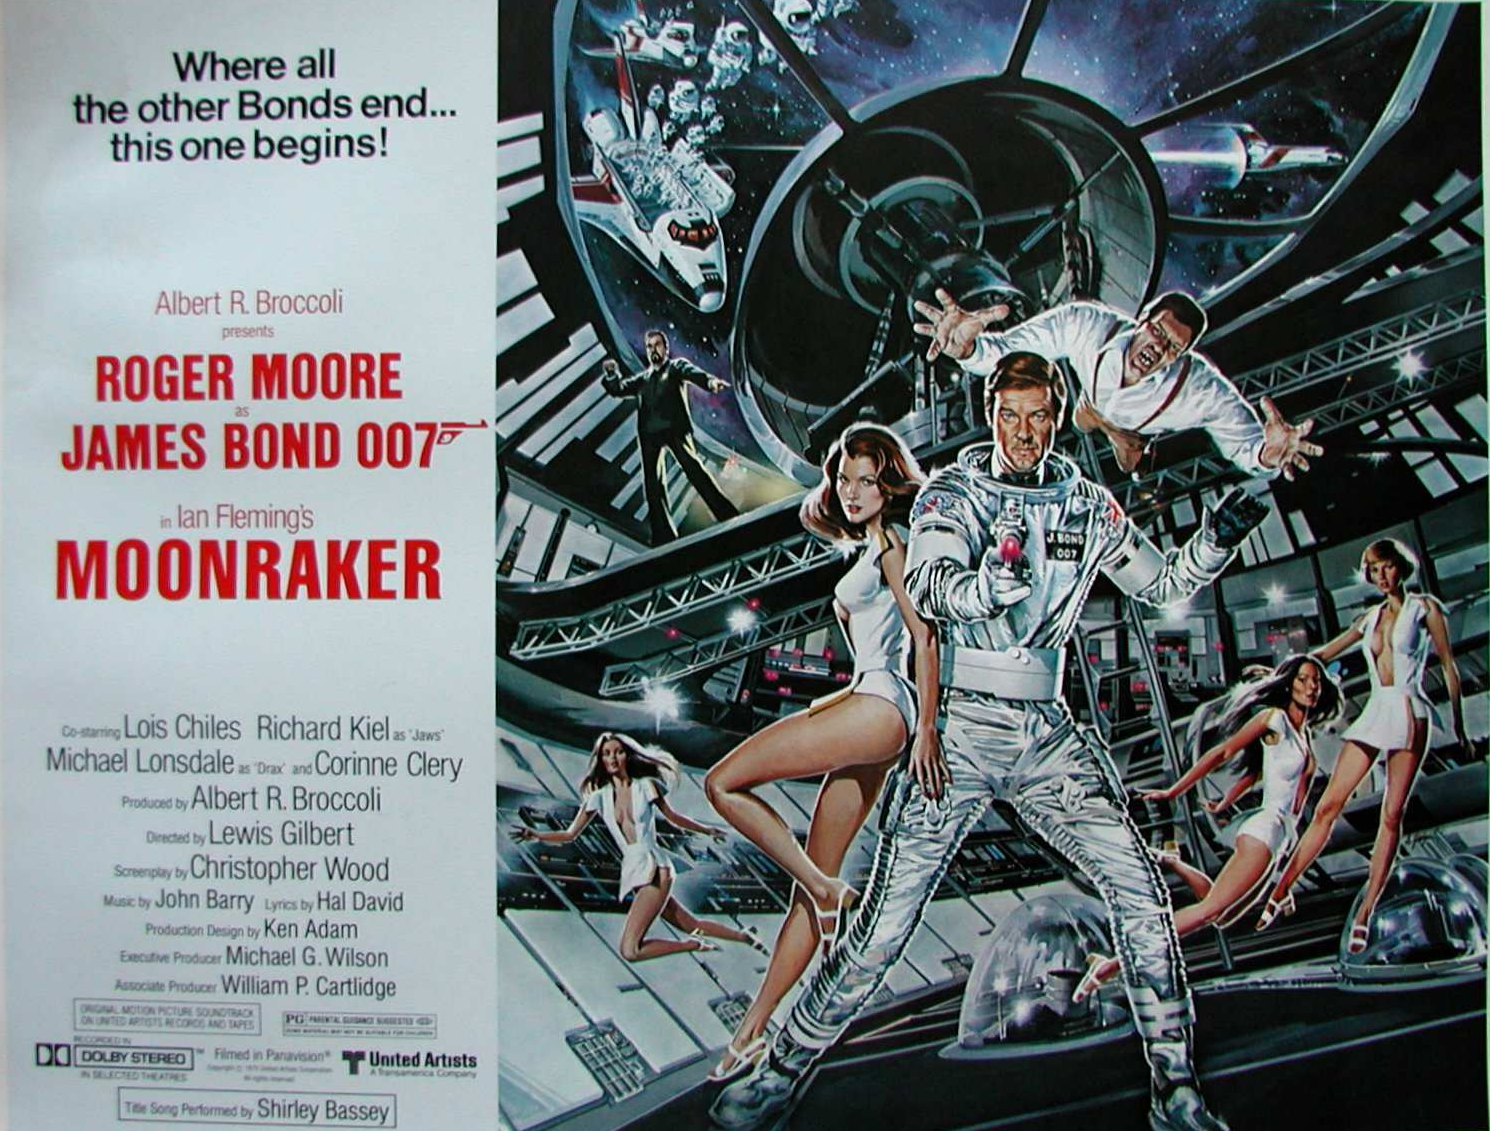 Moonraker Backgrounds on Wallpapers Vista